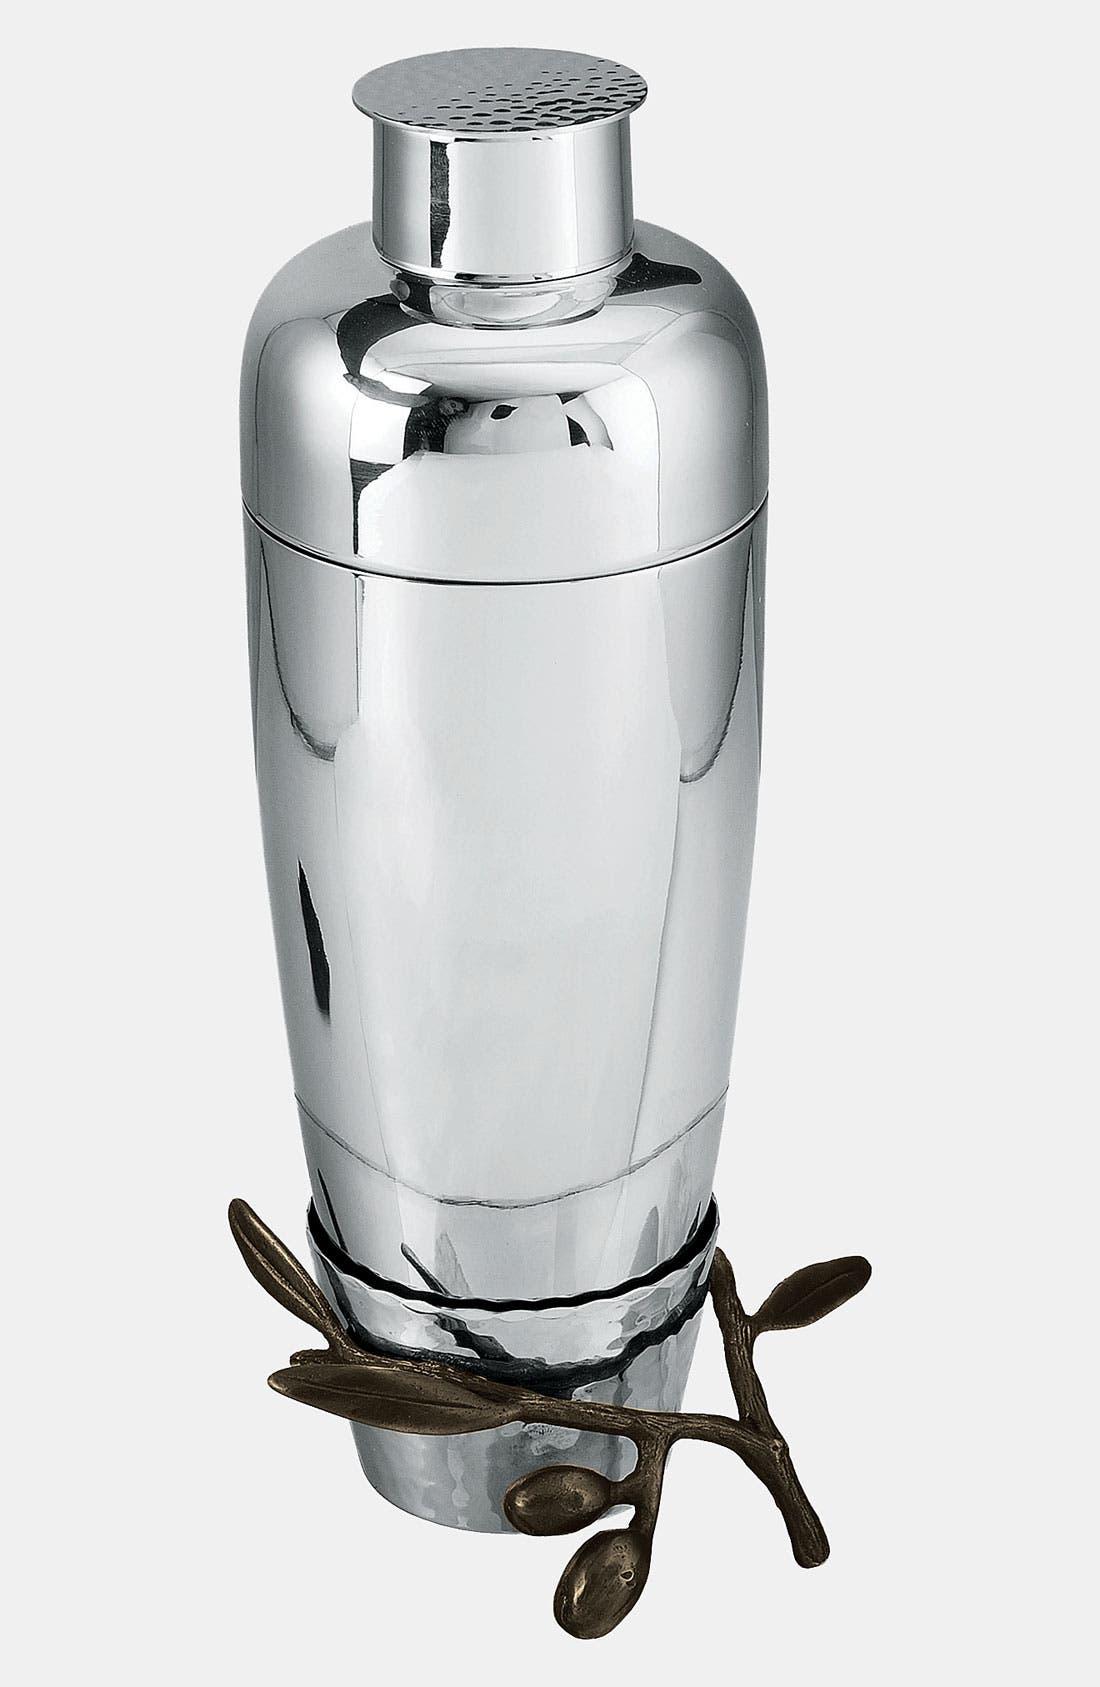 Alternate Image 1 Selected - Michael Aram 'Olive Branch' Martini Shaker